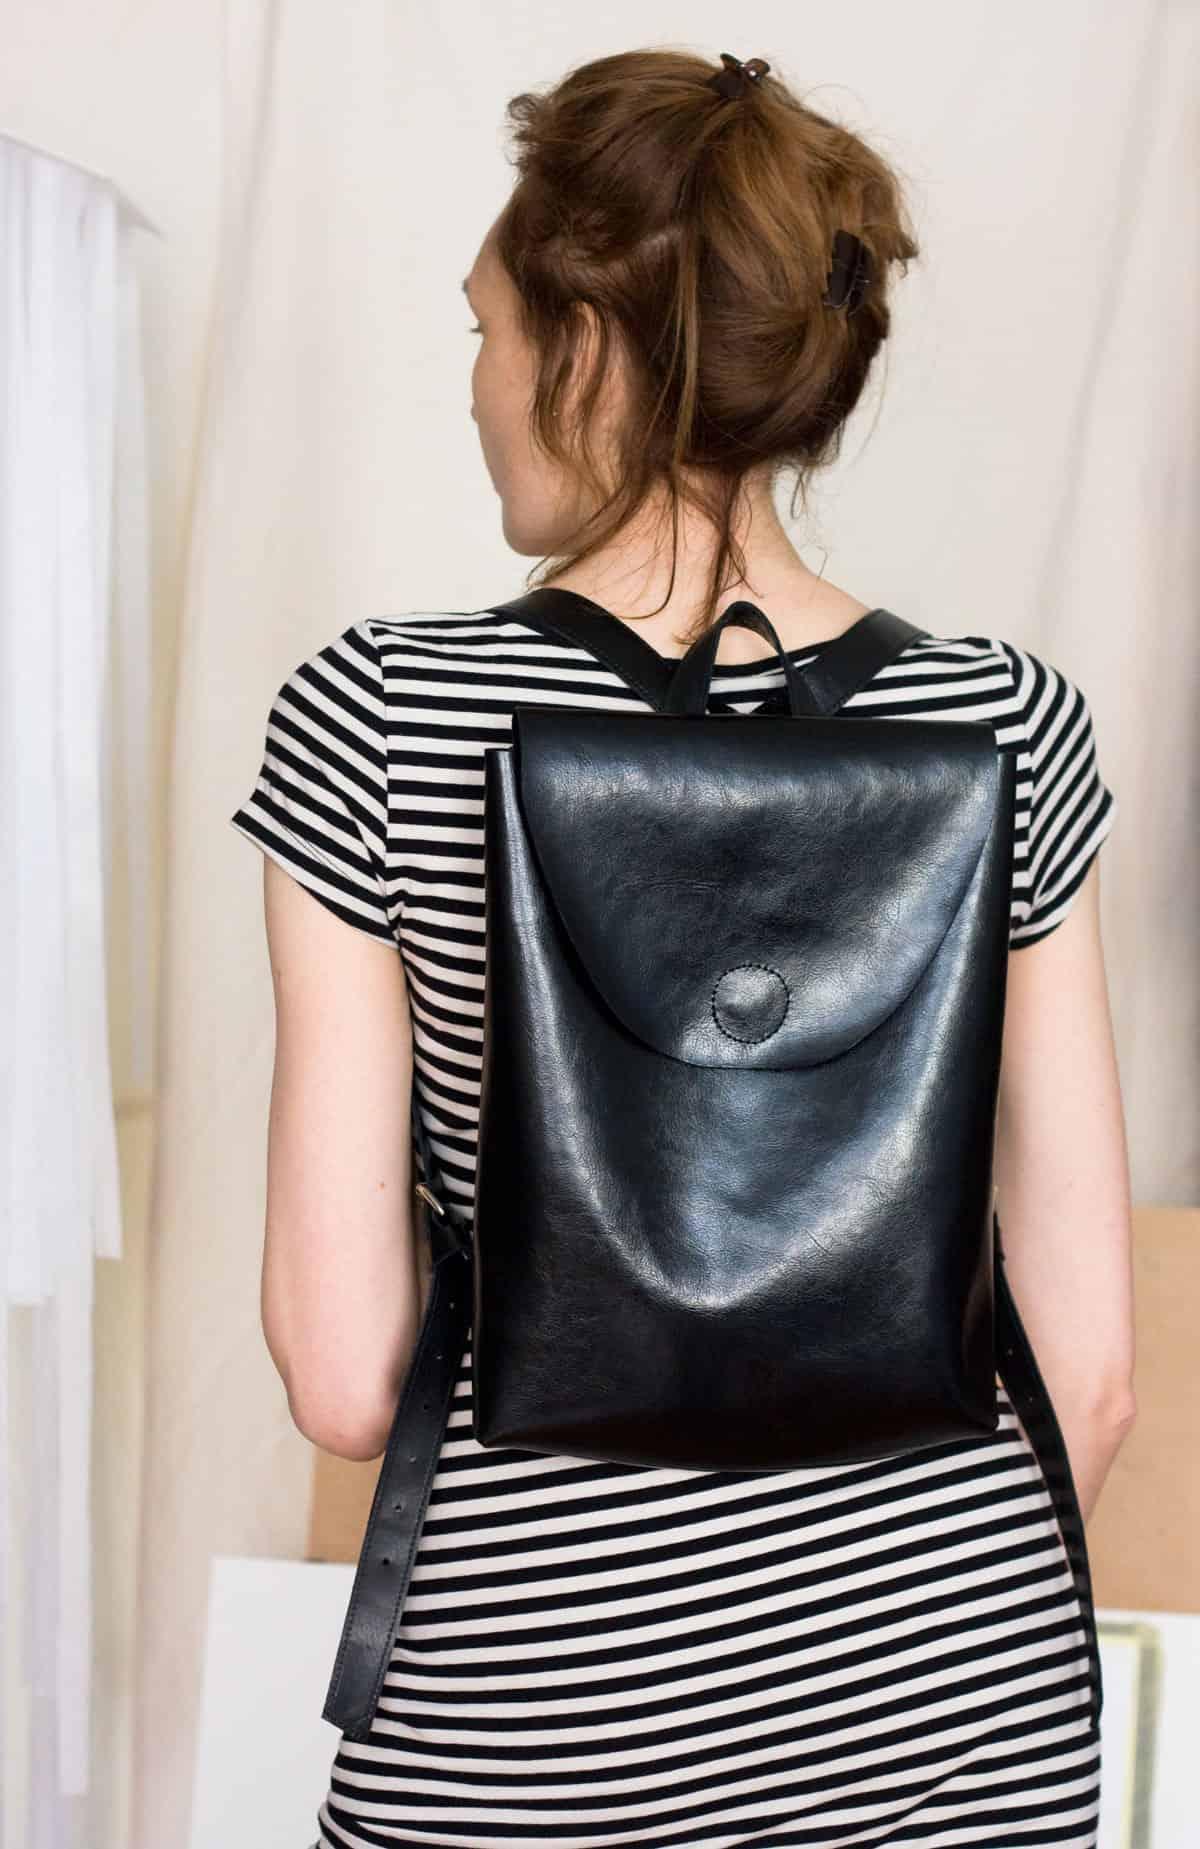 czarny-lekki-plecak-skora01h